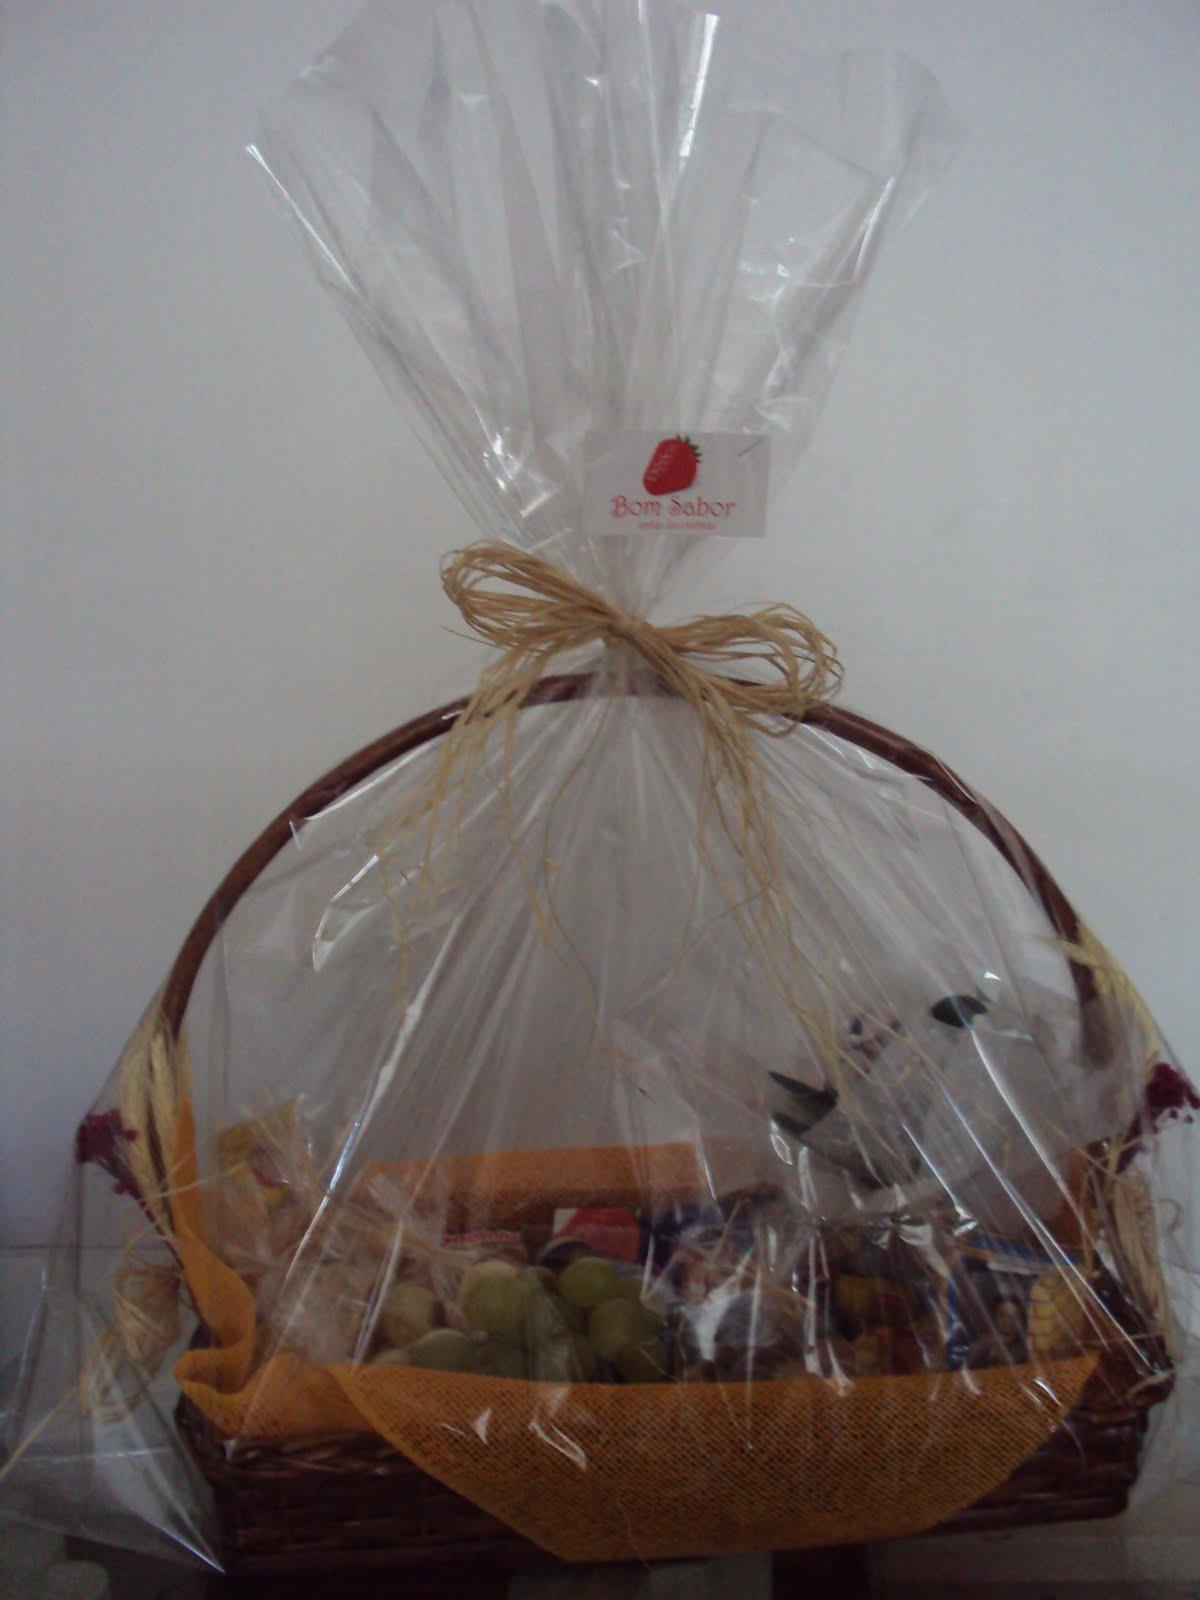 Bom sabor cestas decorativas - Cestas decorativas ...